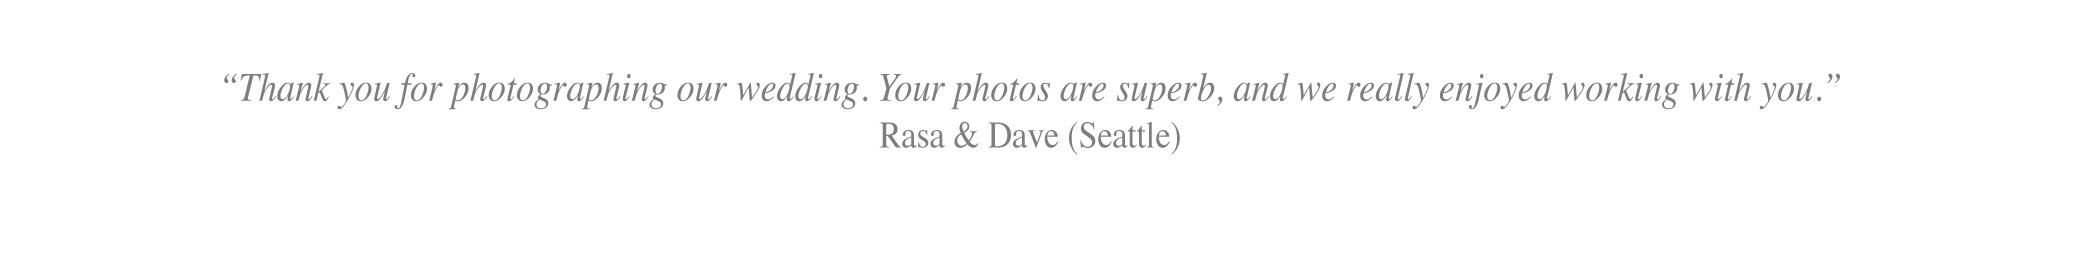 SquareSpace_Testimonials (Rasa).jpg